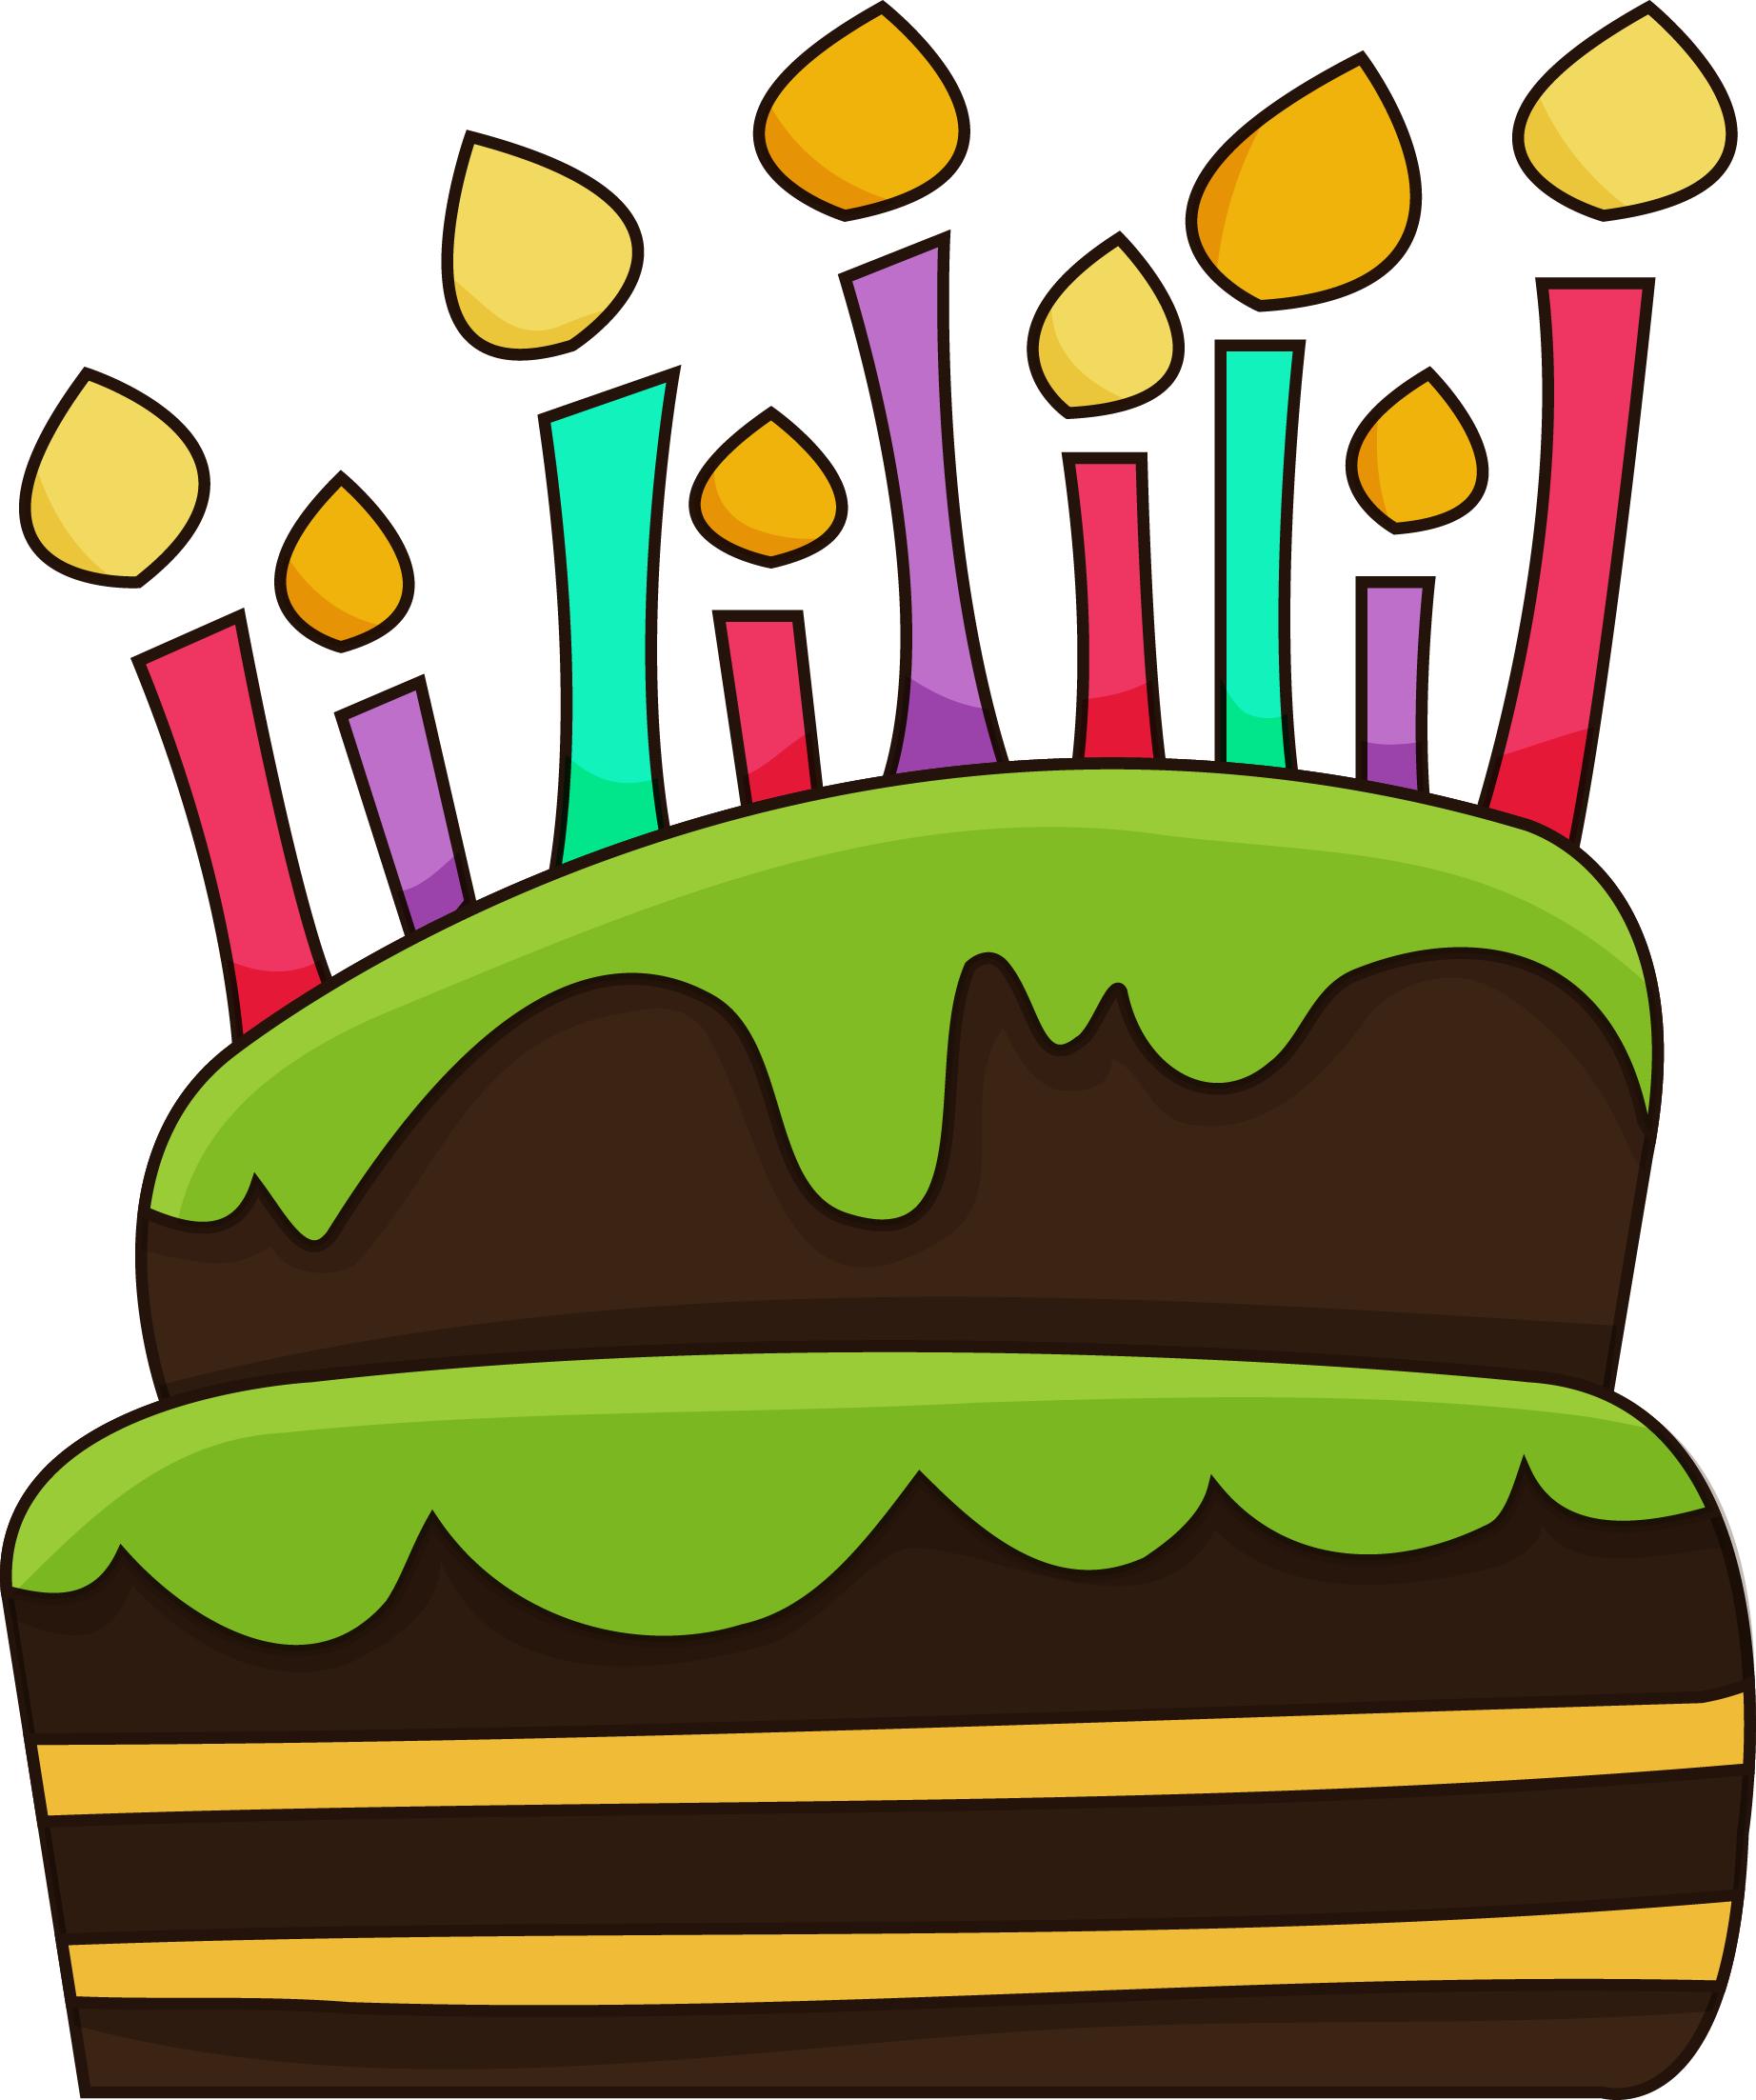 1844x2205 Drawn Birthday Birthday Cake